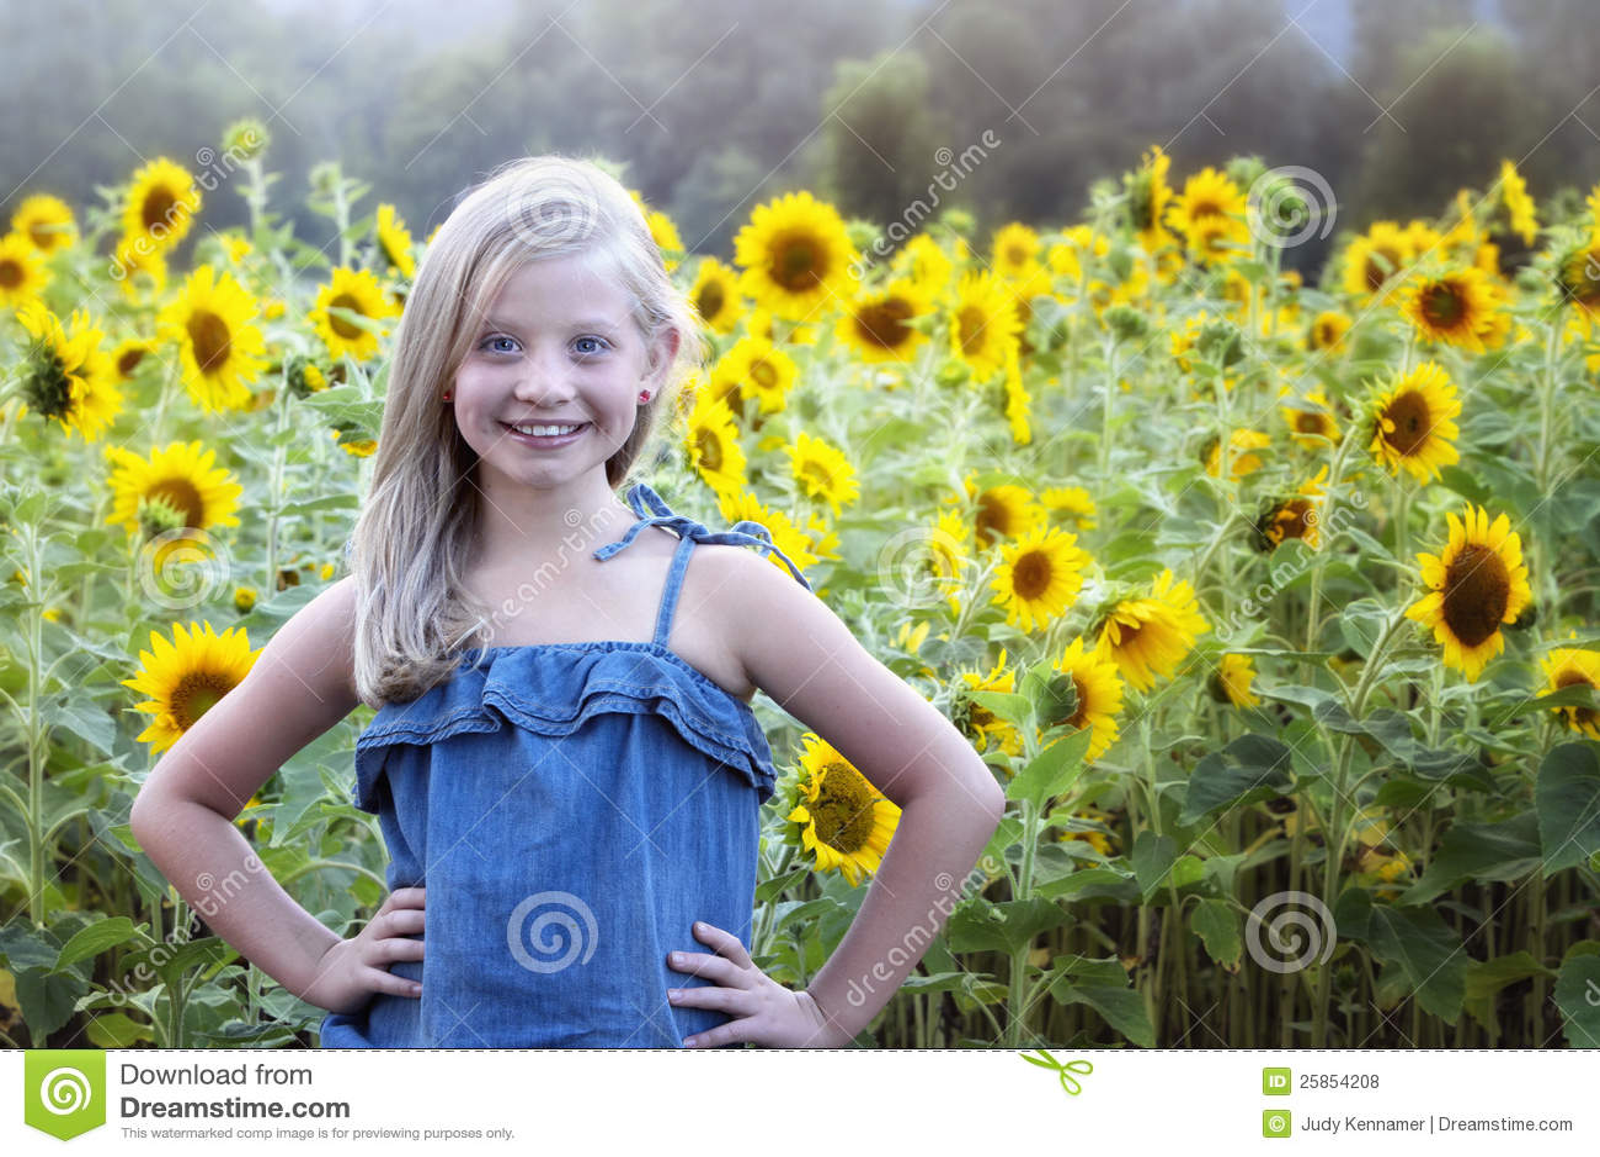 Beautiful little girl in front of sunflower field